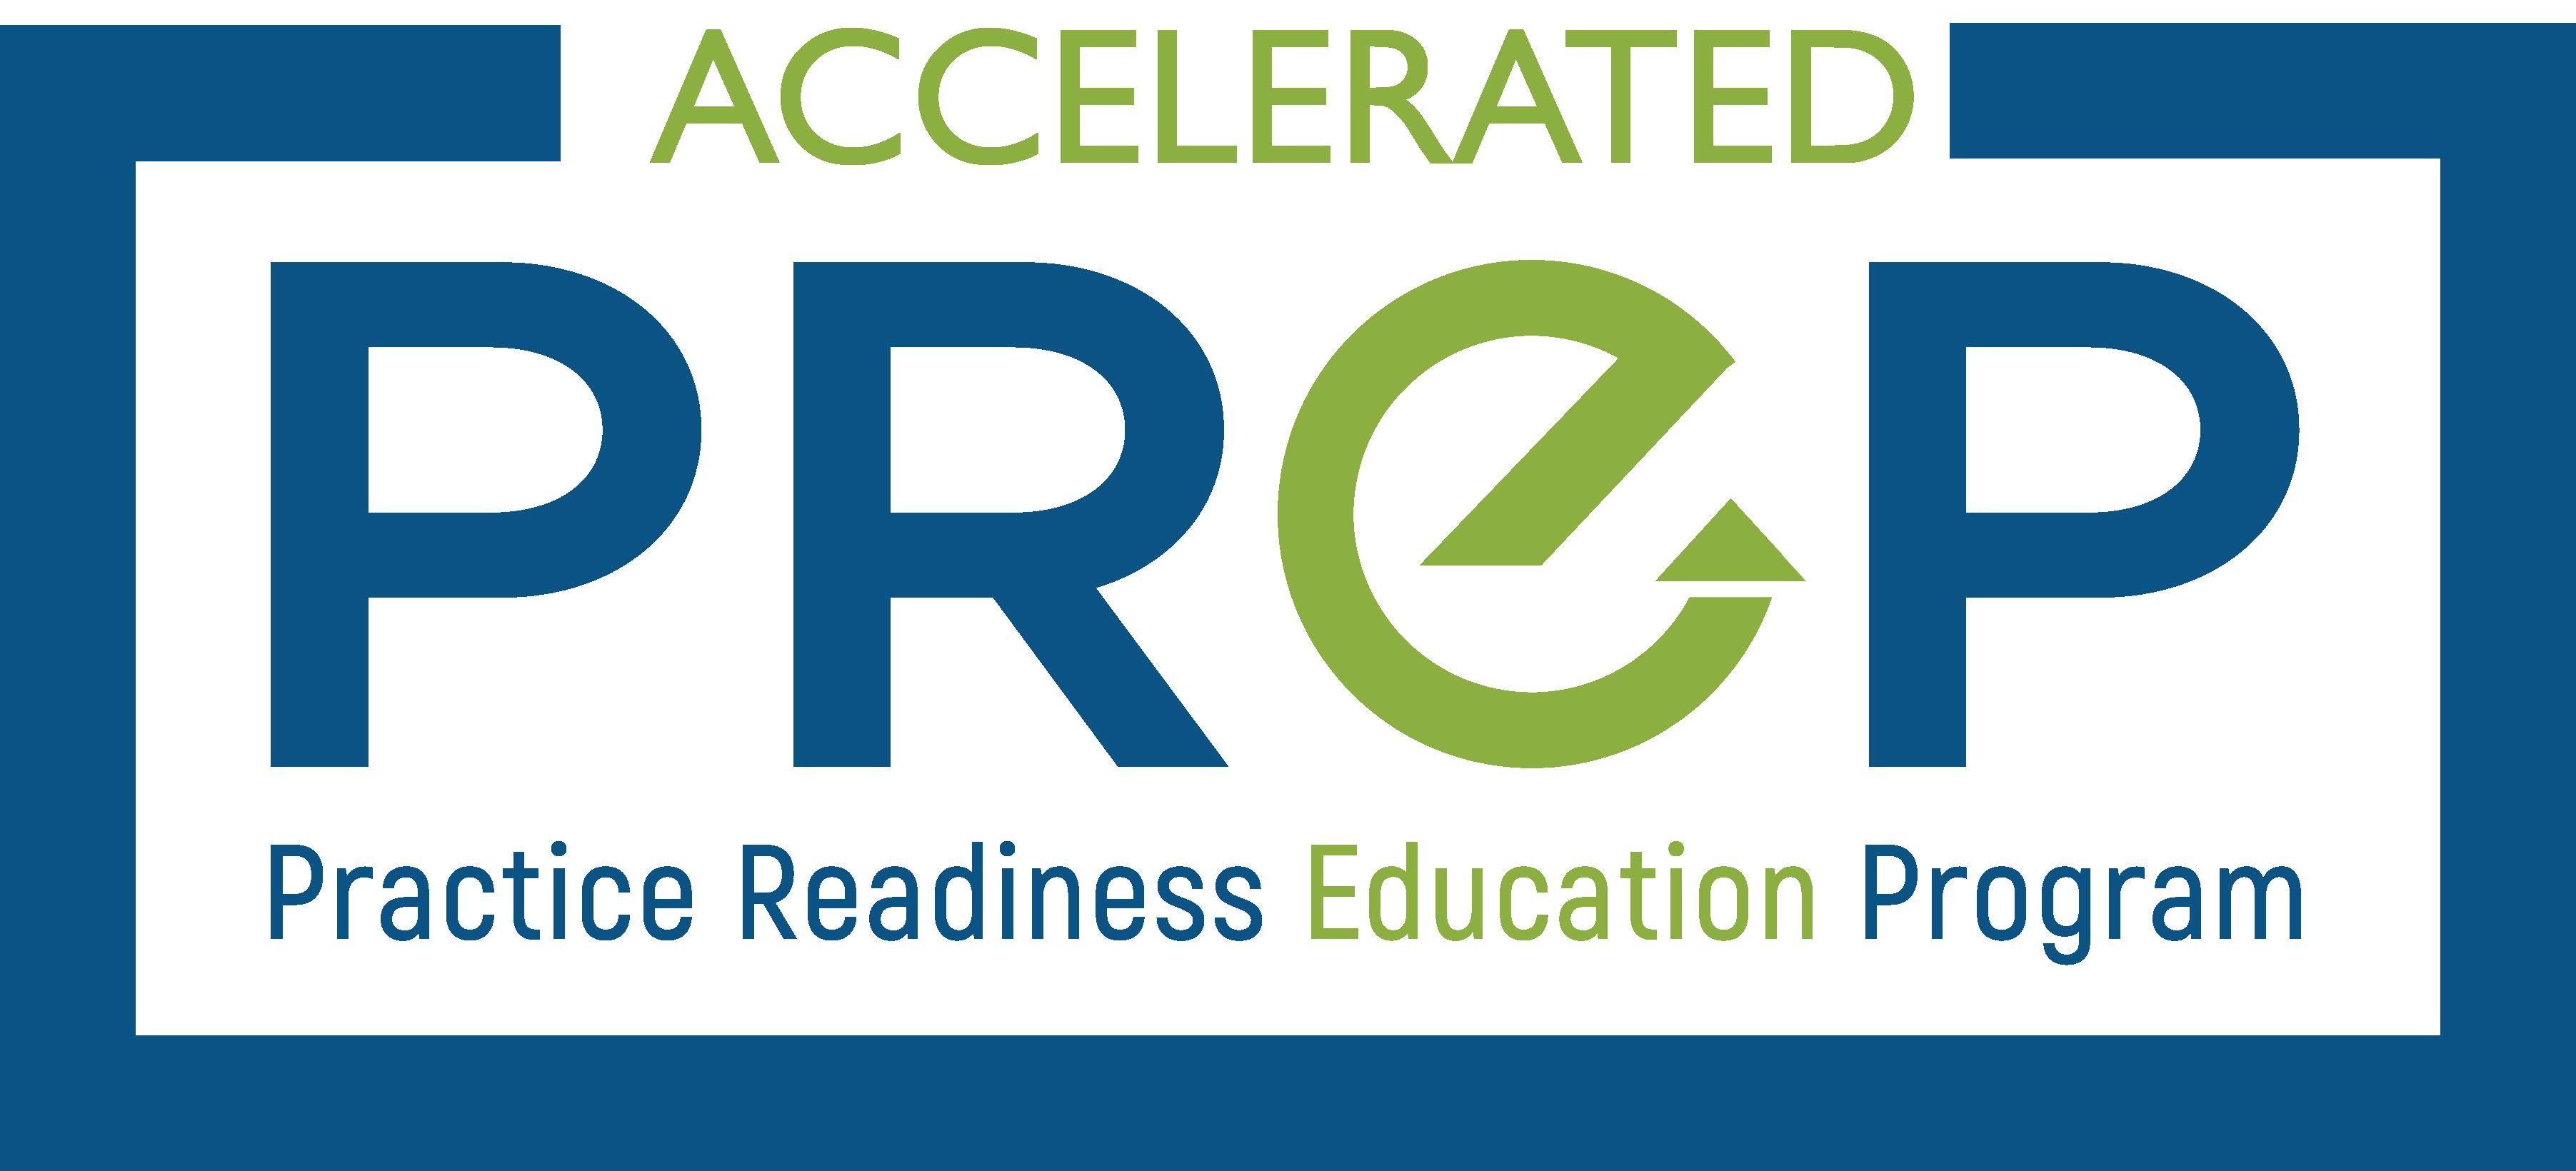 Accelerated PREP Logo